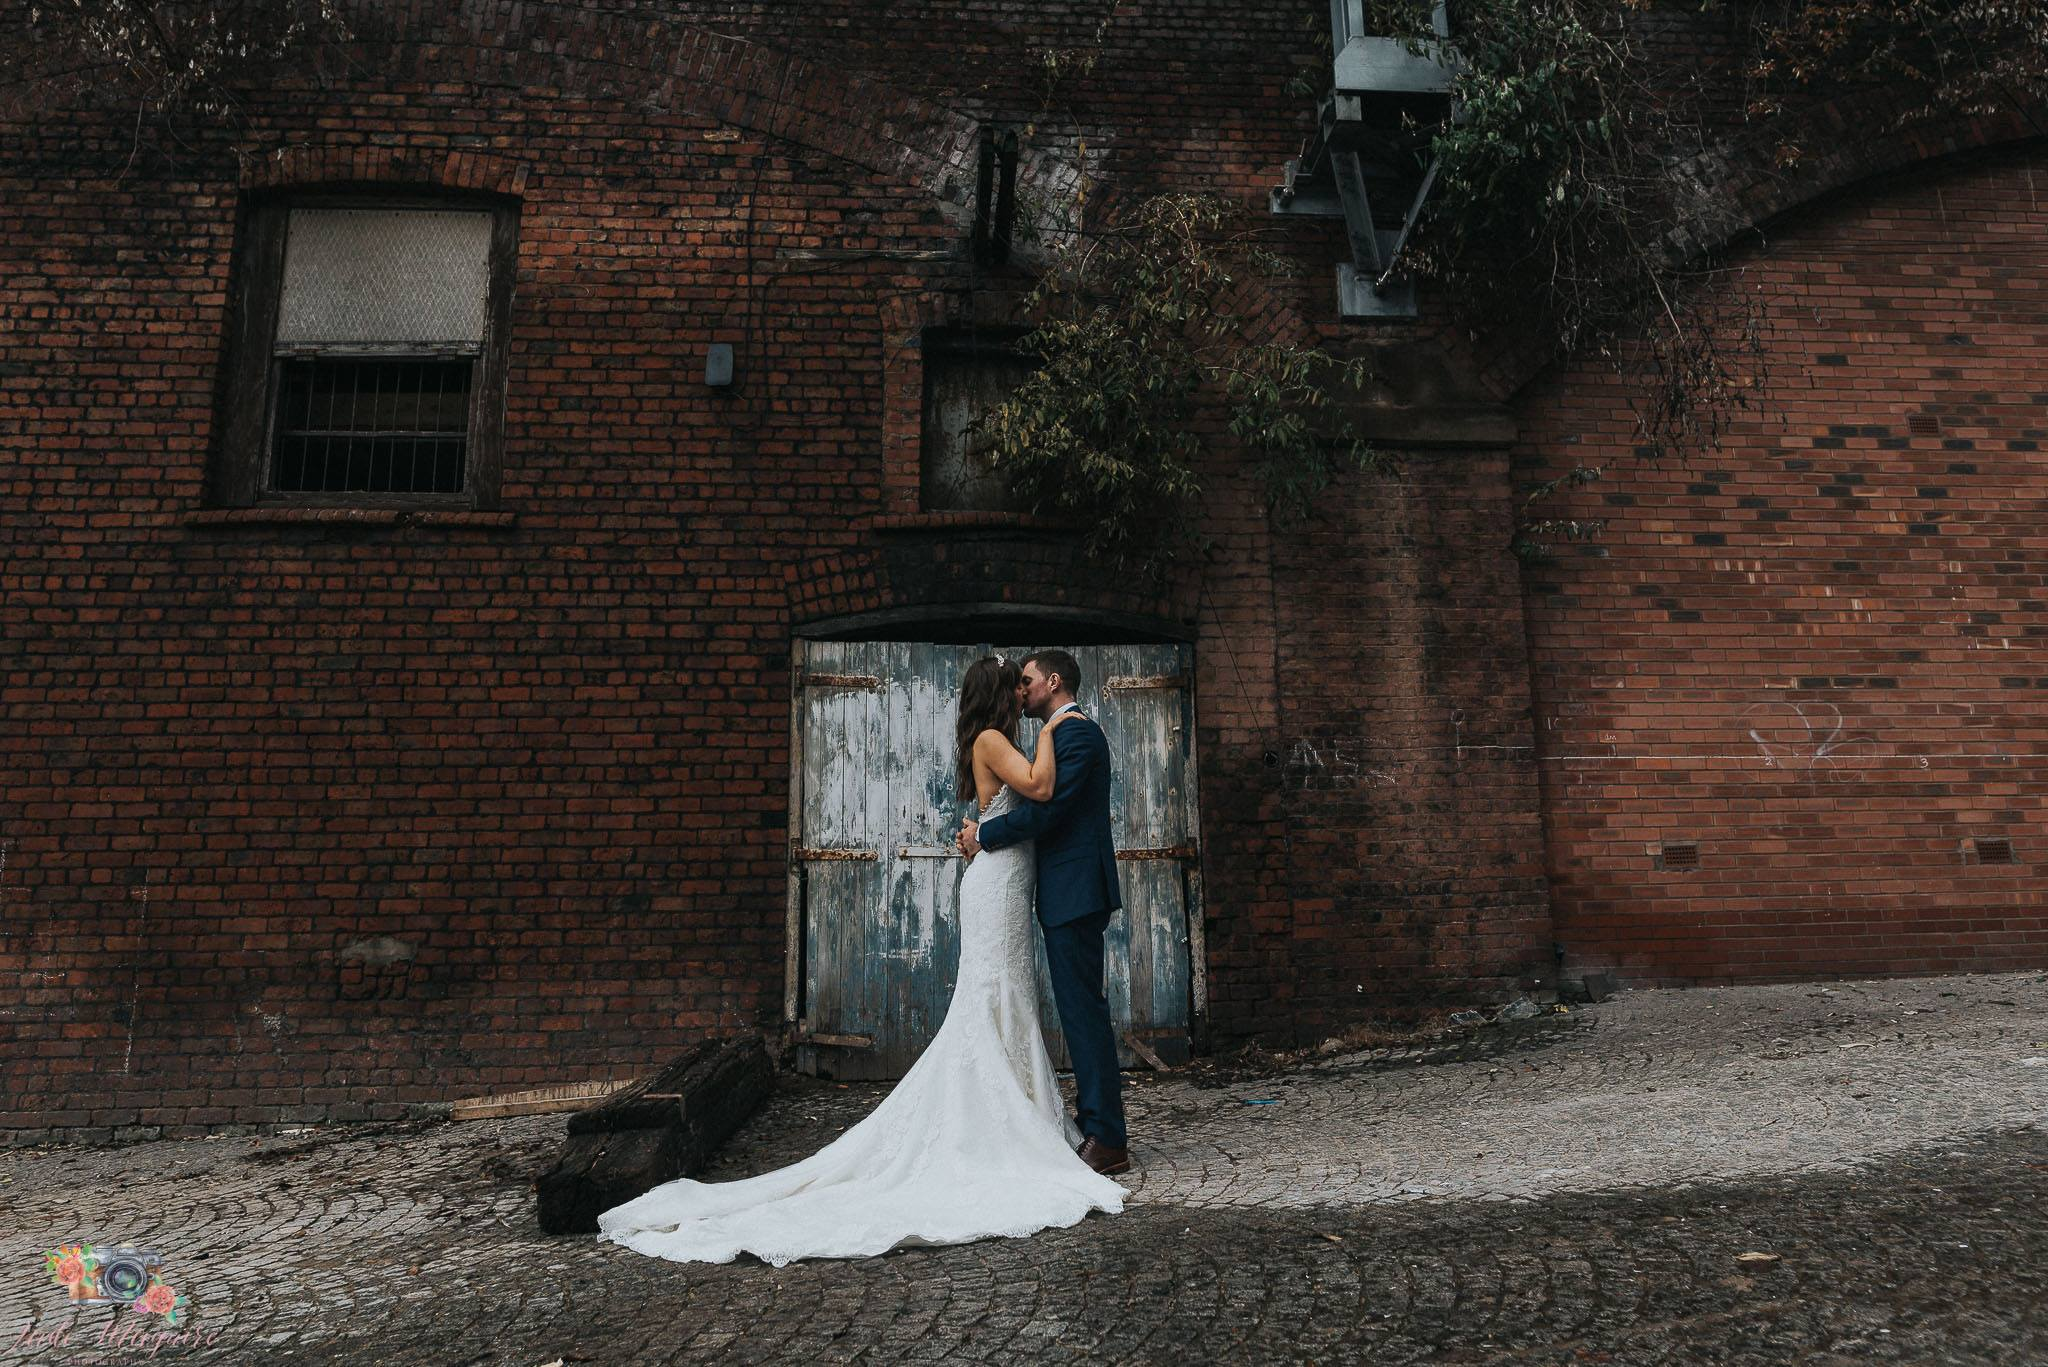 Urban wedding photography workshop - manchester